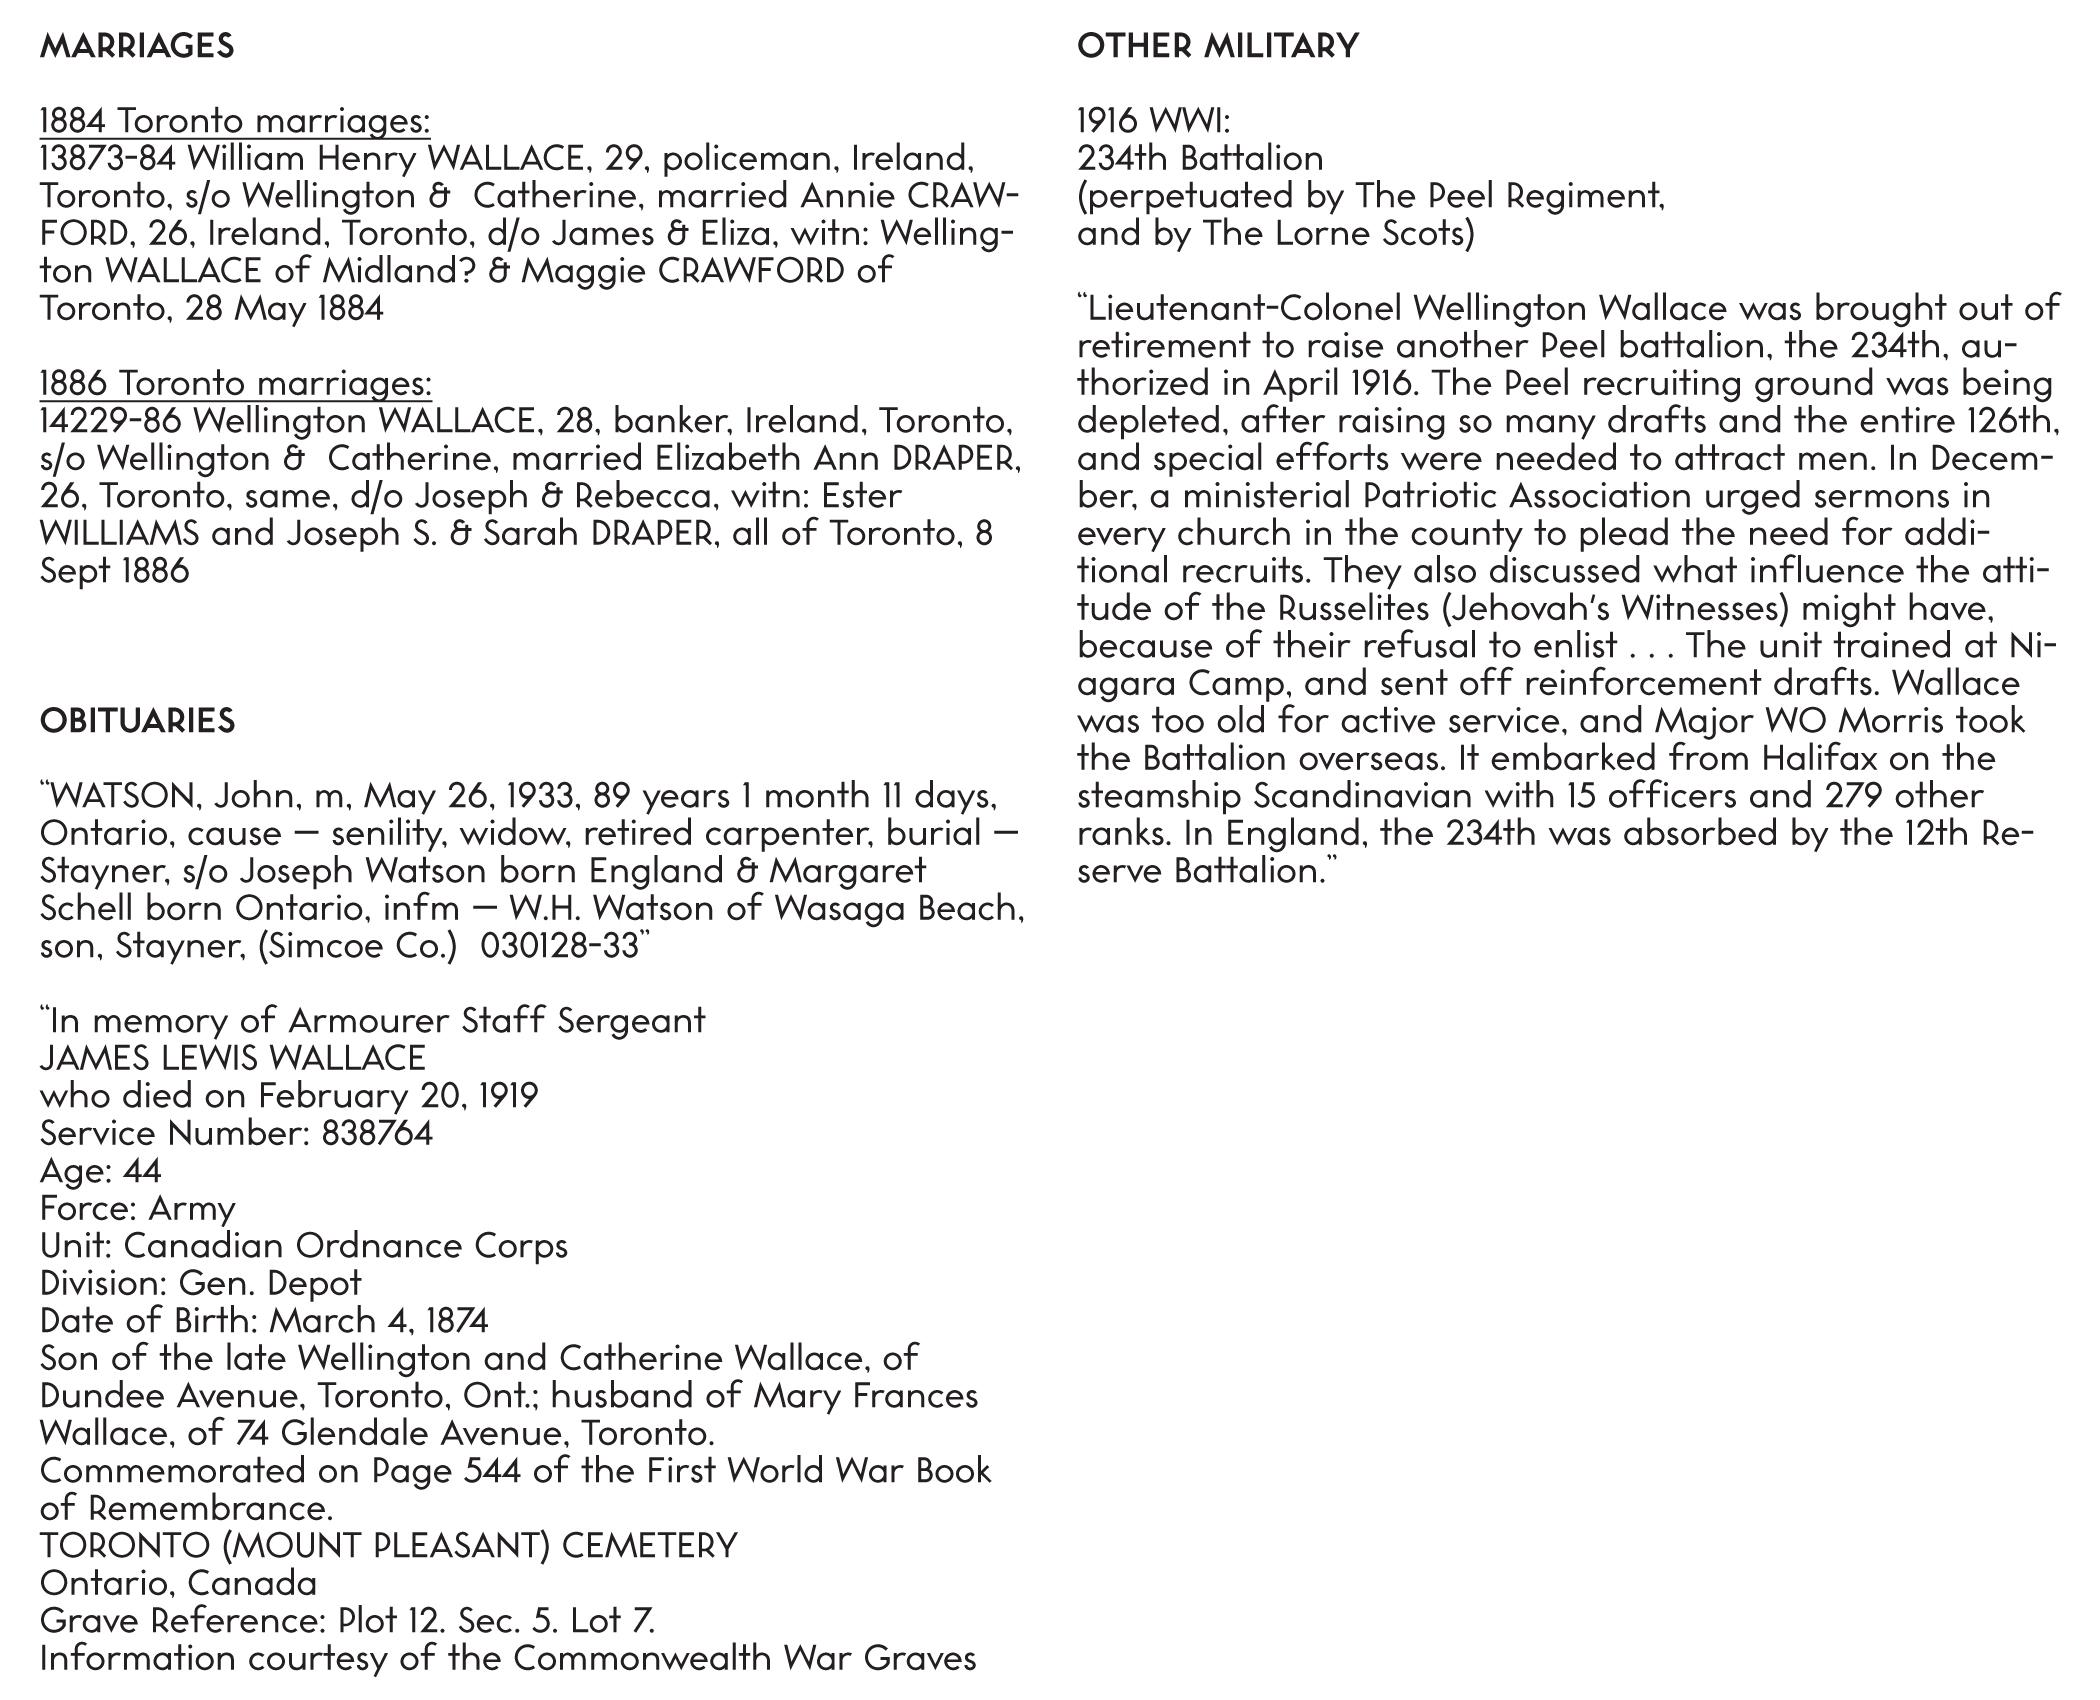 city directory listings by year — Wellington (Sr.), Wellington (Jr.), and John Watson